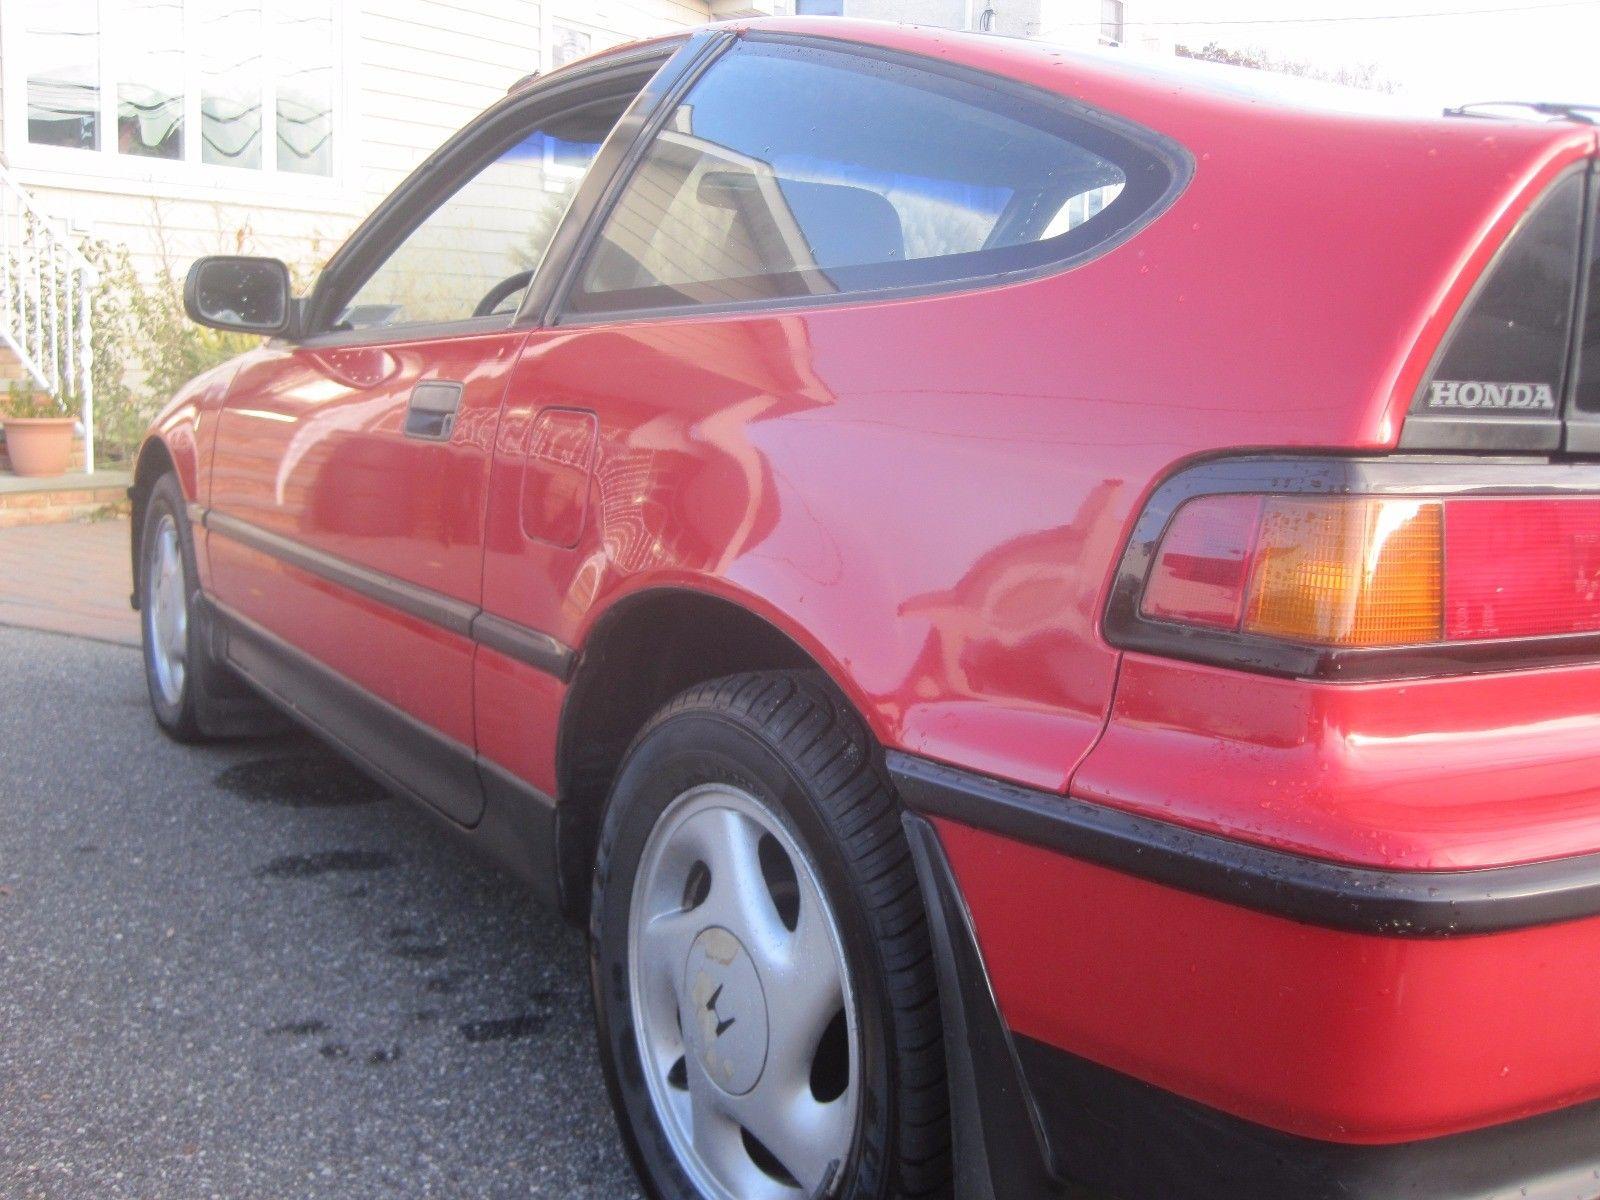 1991 Honda CRX si rear quarter detail